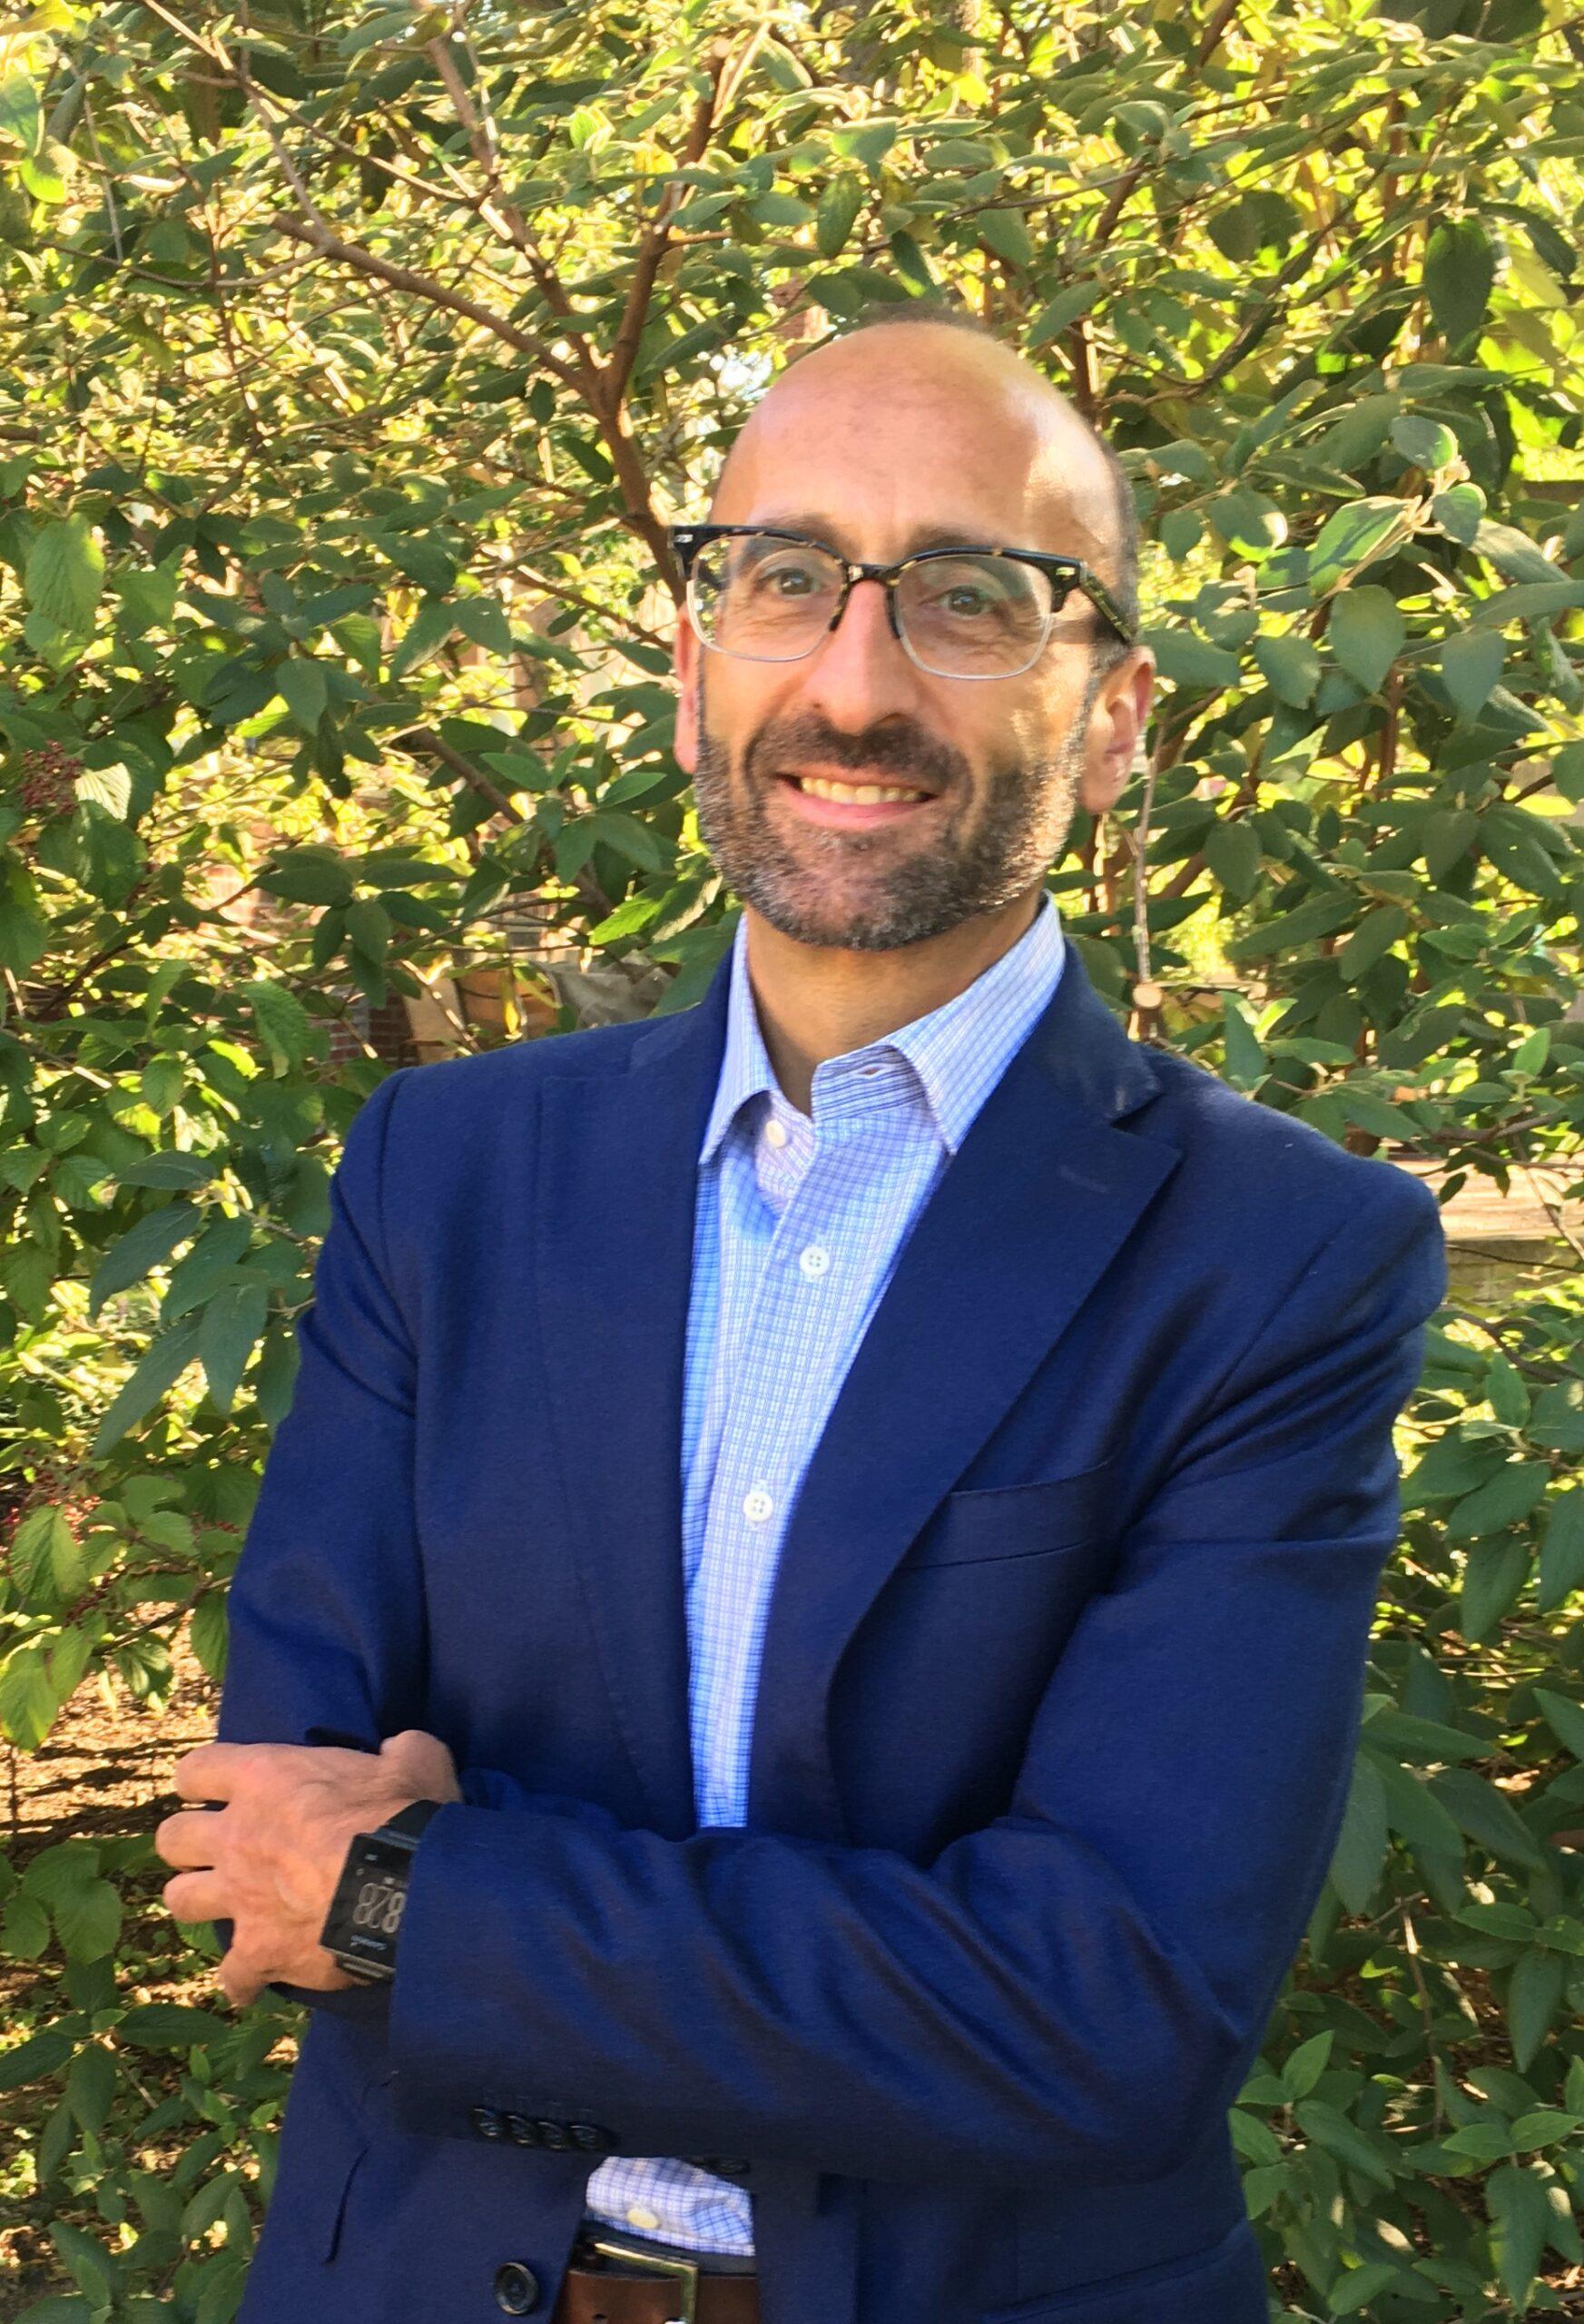 Daniel Feder, Managing Director, University of Michigan Investment Office